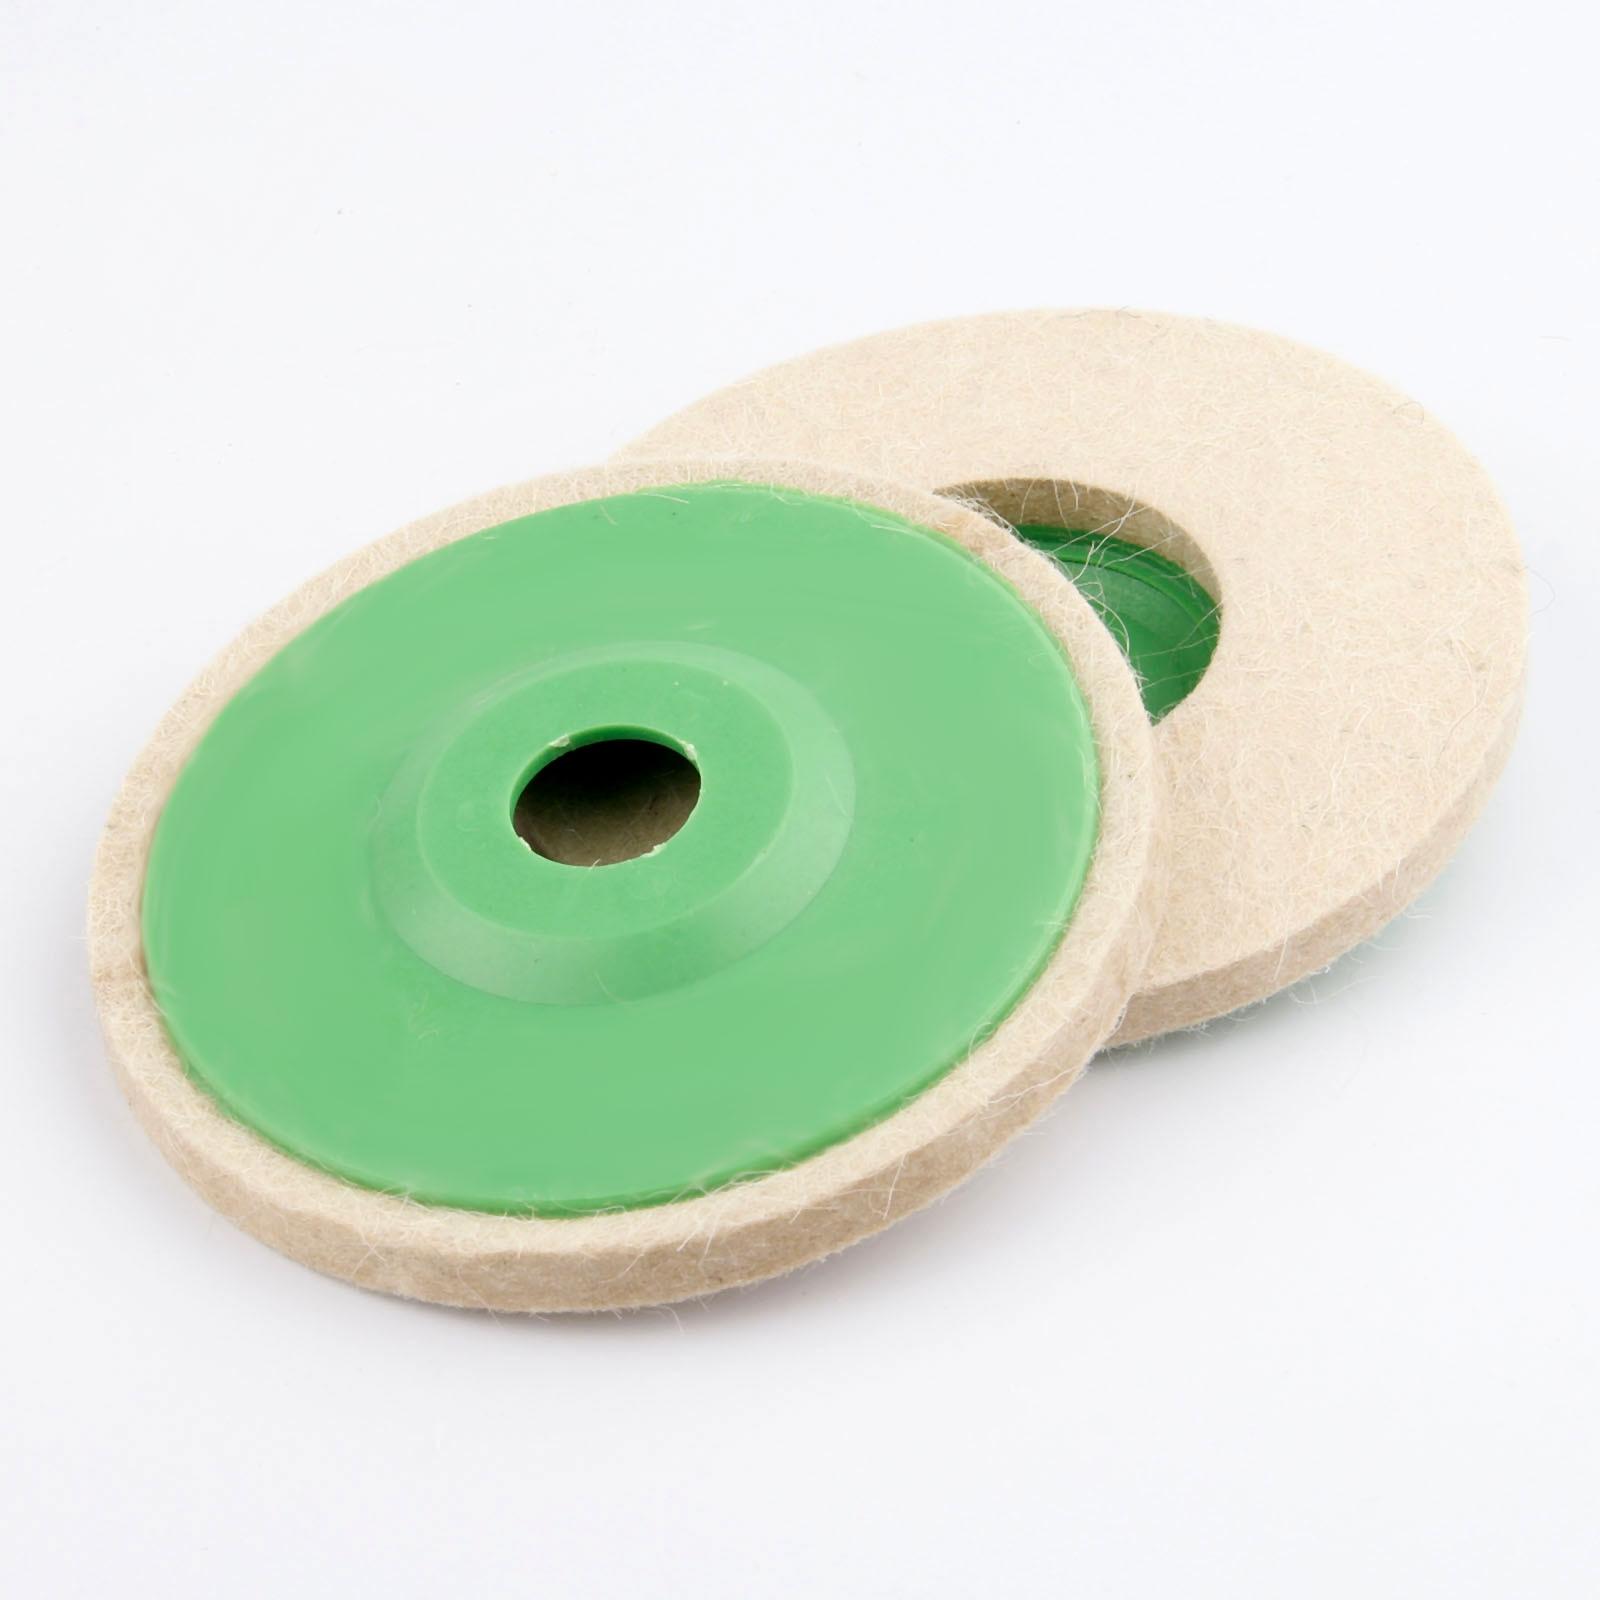 125mm Wool Felt Buffing Grinding Wheel Pad Buffer Polishing Wood Glass Car Disc